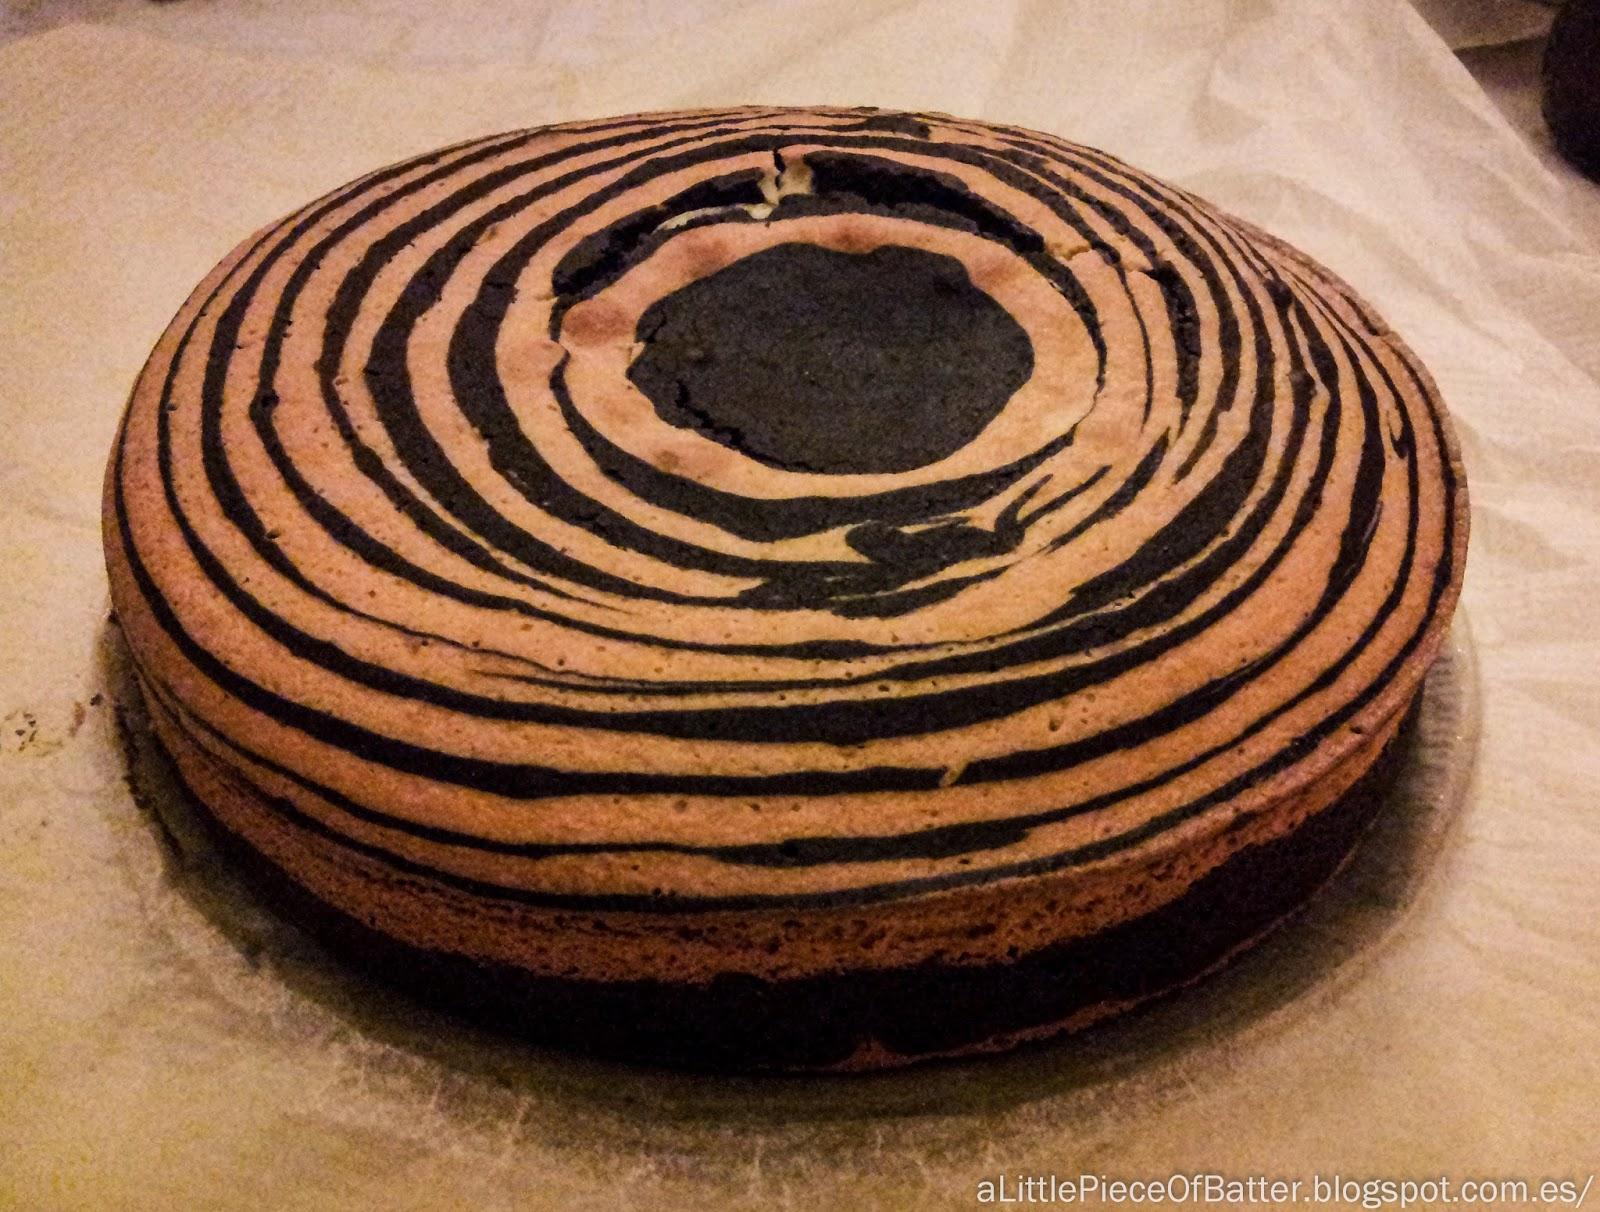 Zebra Cake - Tarta de Cebra